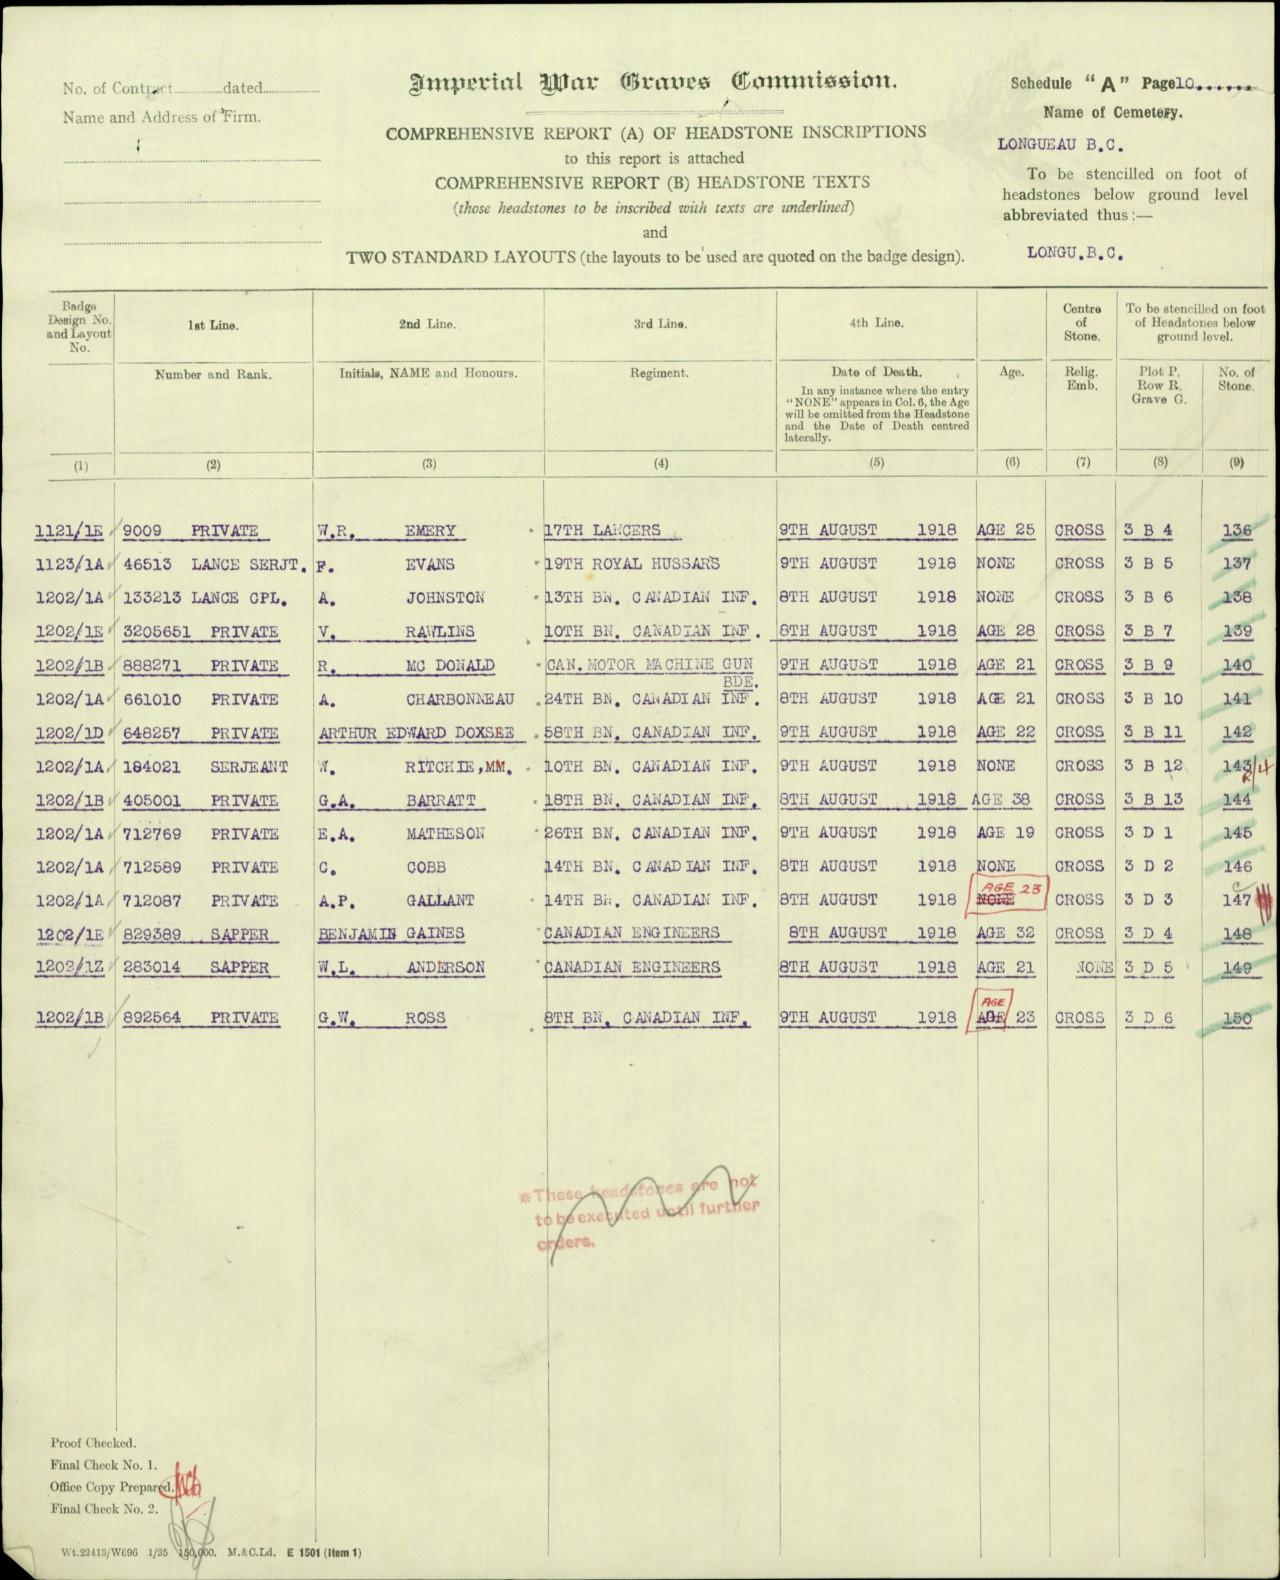 doc2693383